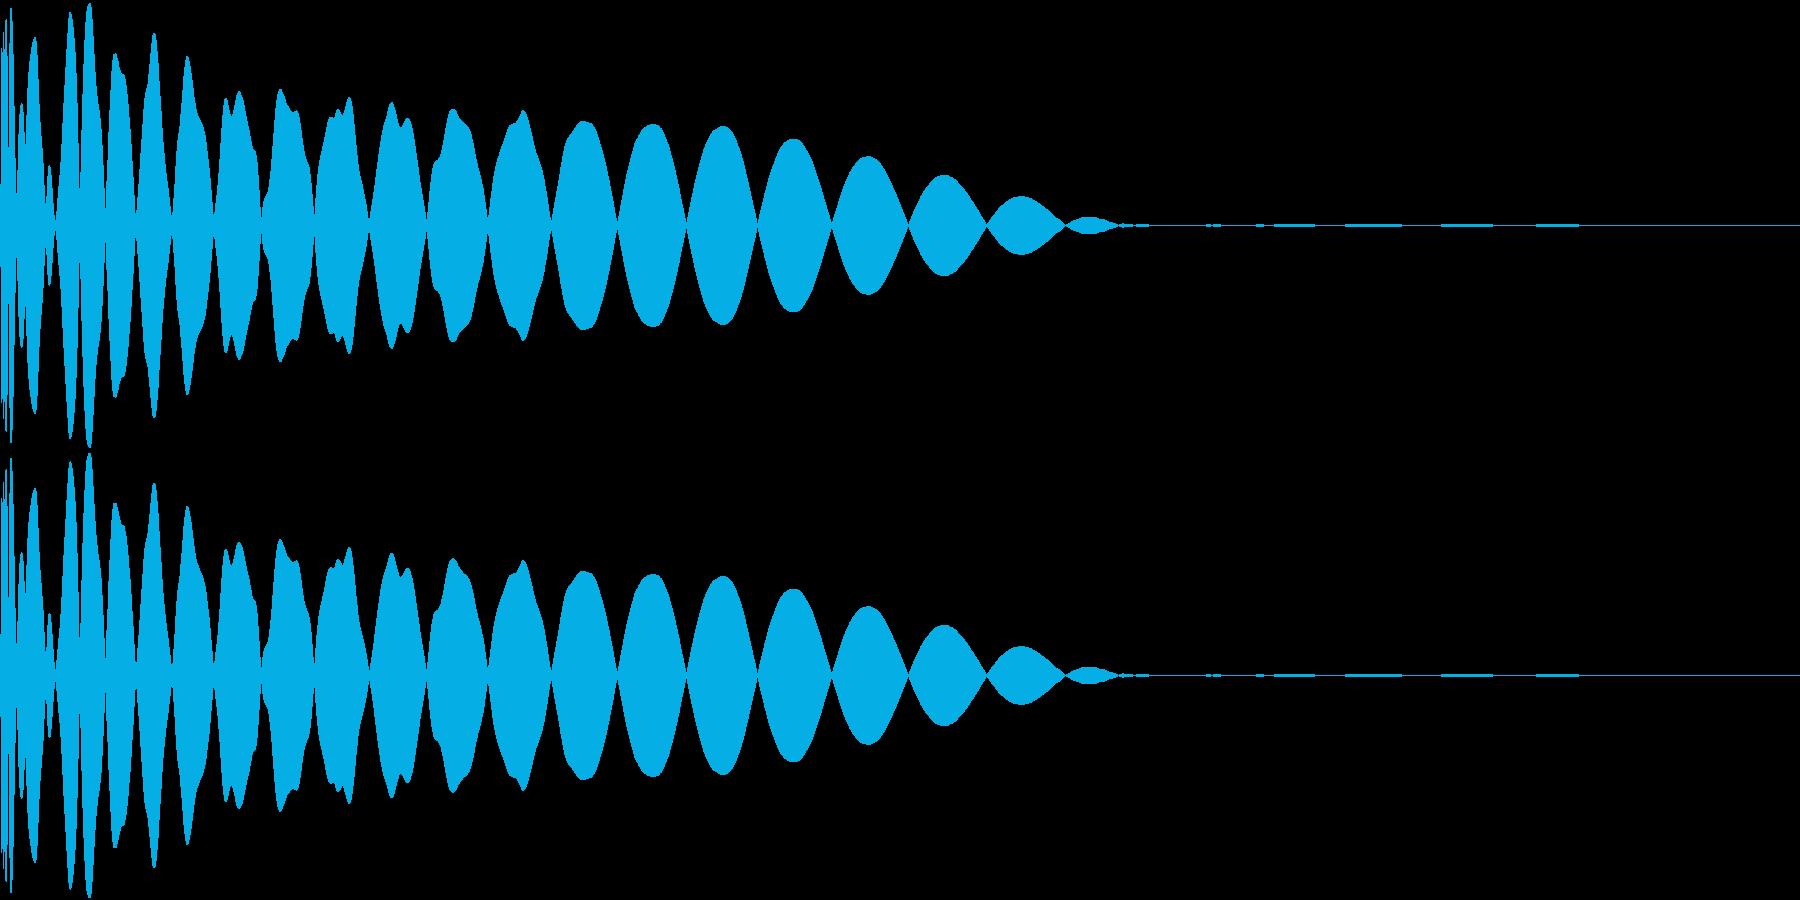 DTM Kick 34 オリジナル音源の再生済みの波形